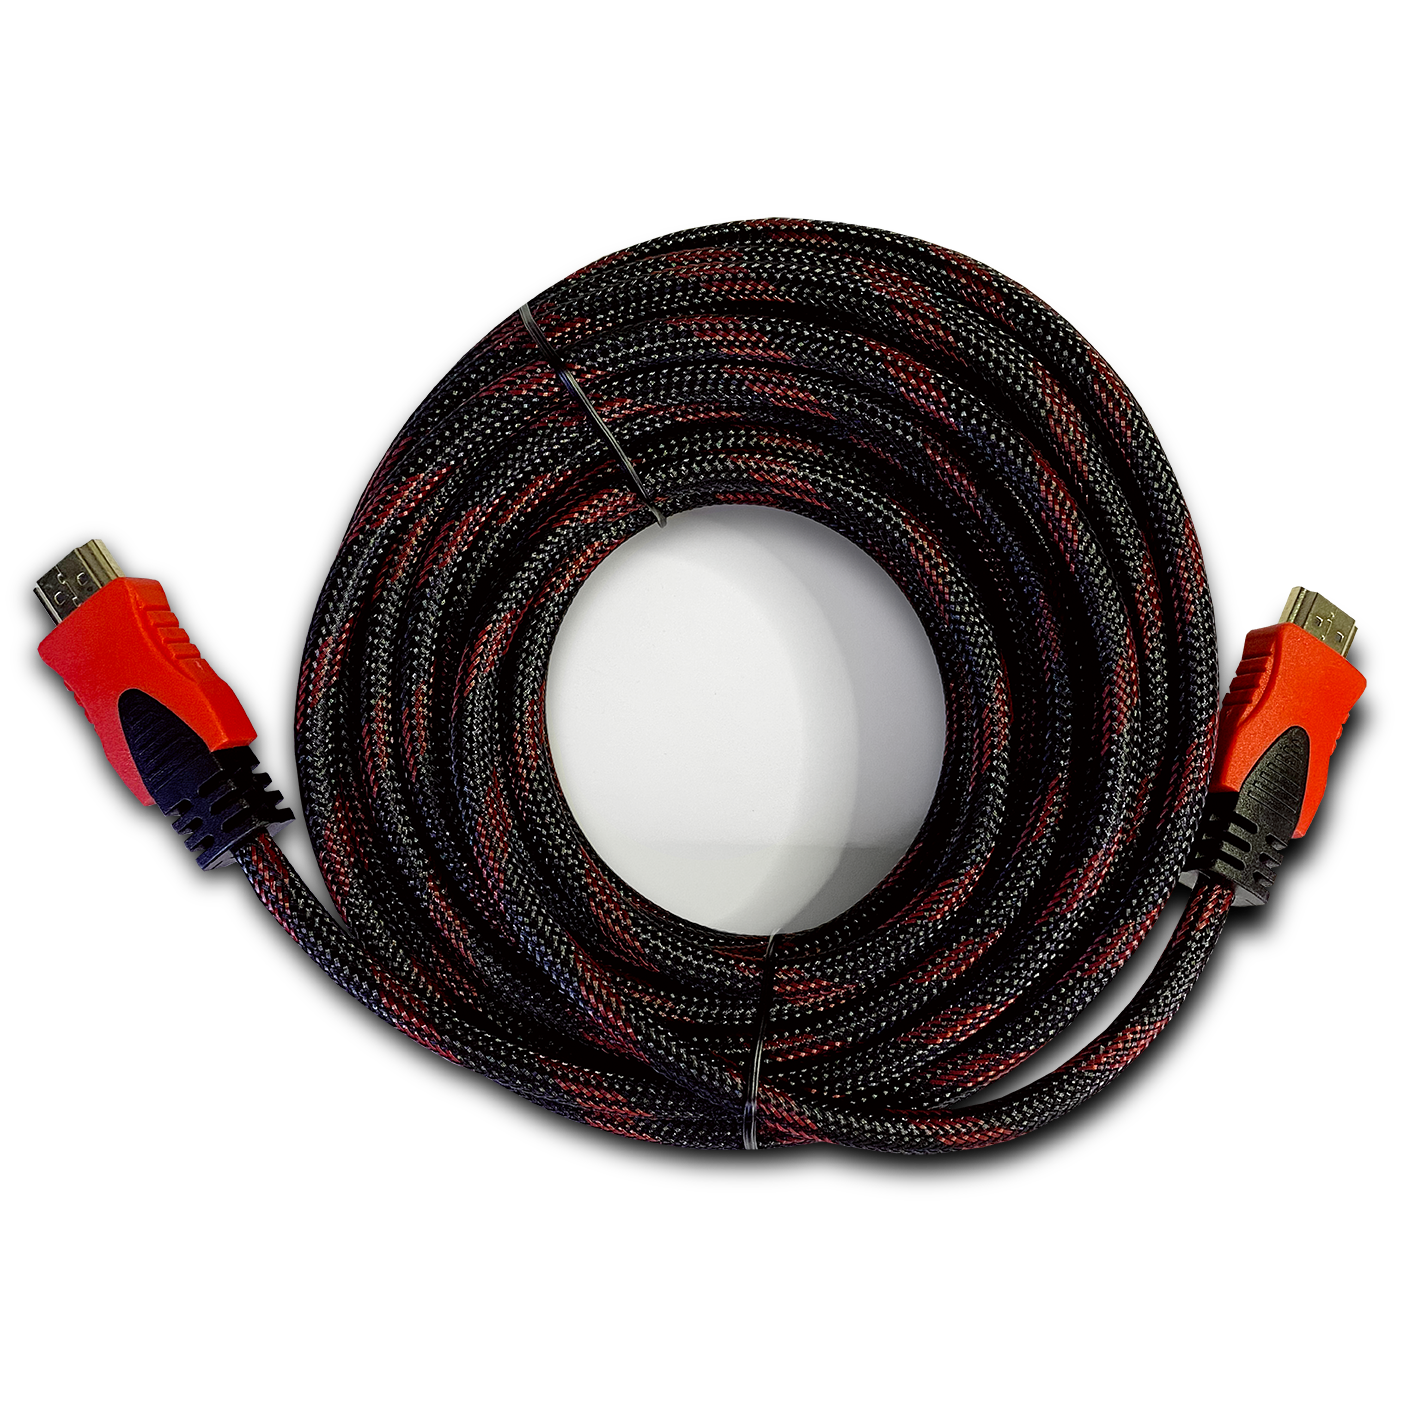 STARK kabl HDMI M-M pozlaćen 4K(Ultra HD), sa zaštitom 10m (Slika 4)